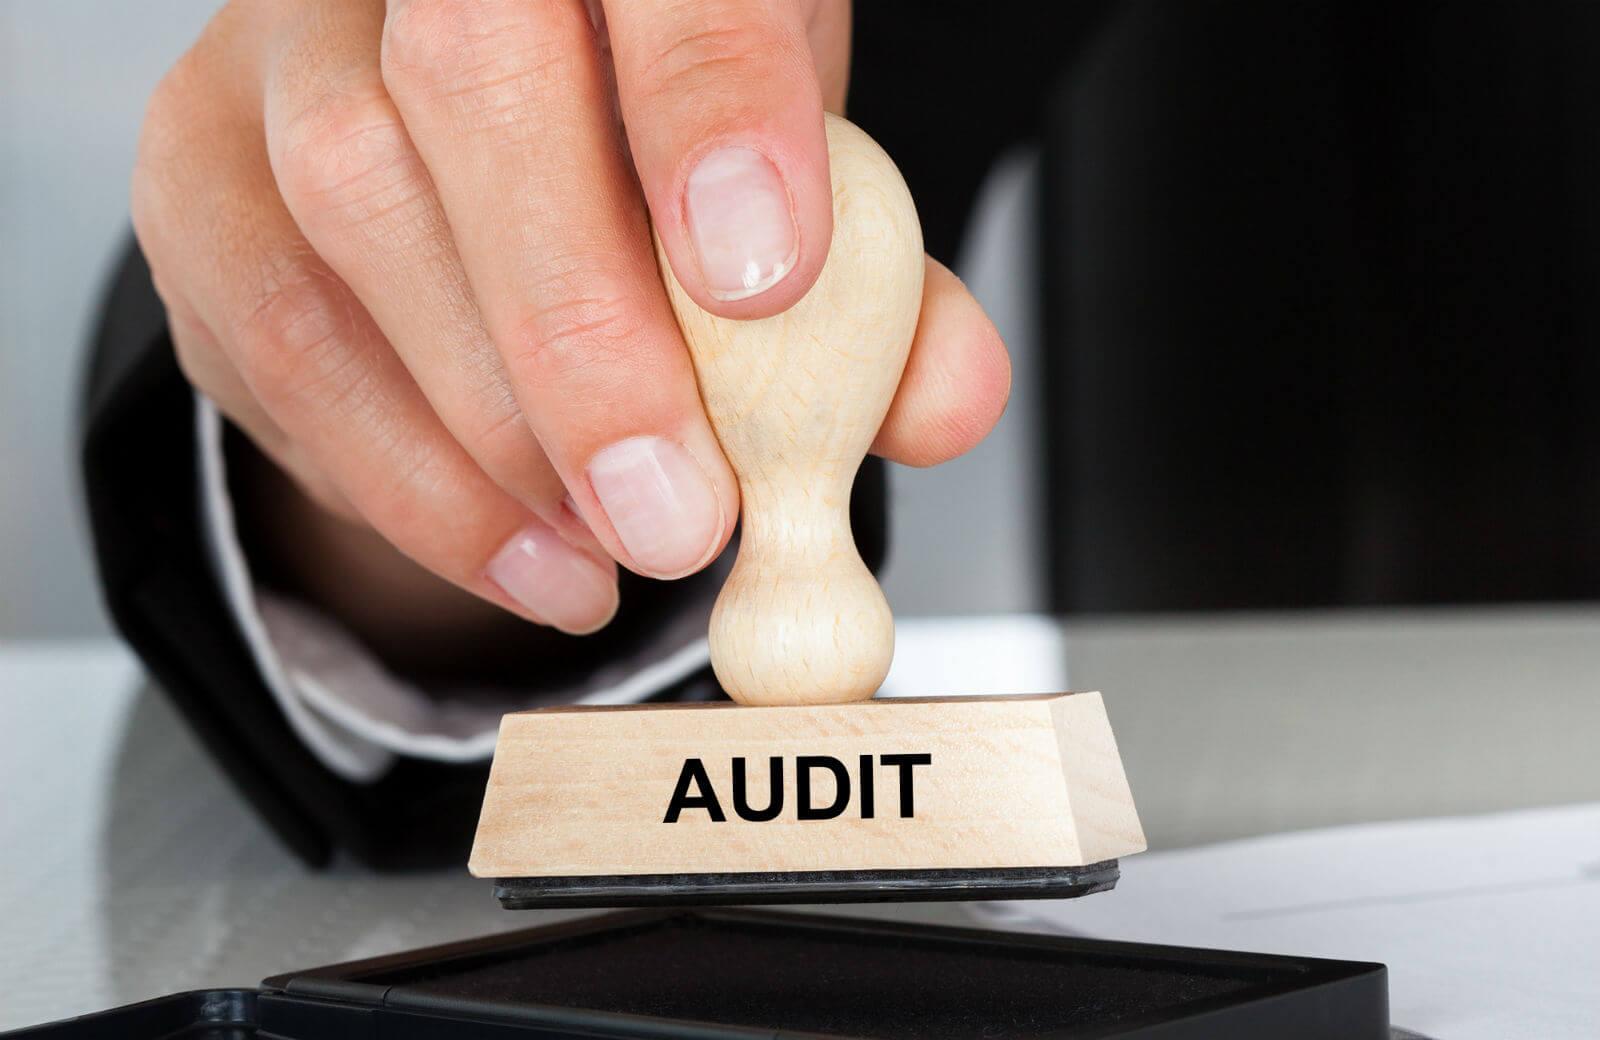 Veiligheidsladder audit